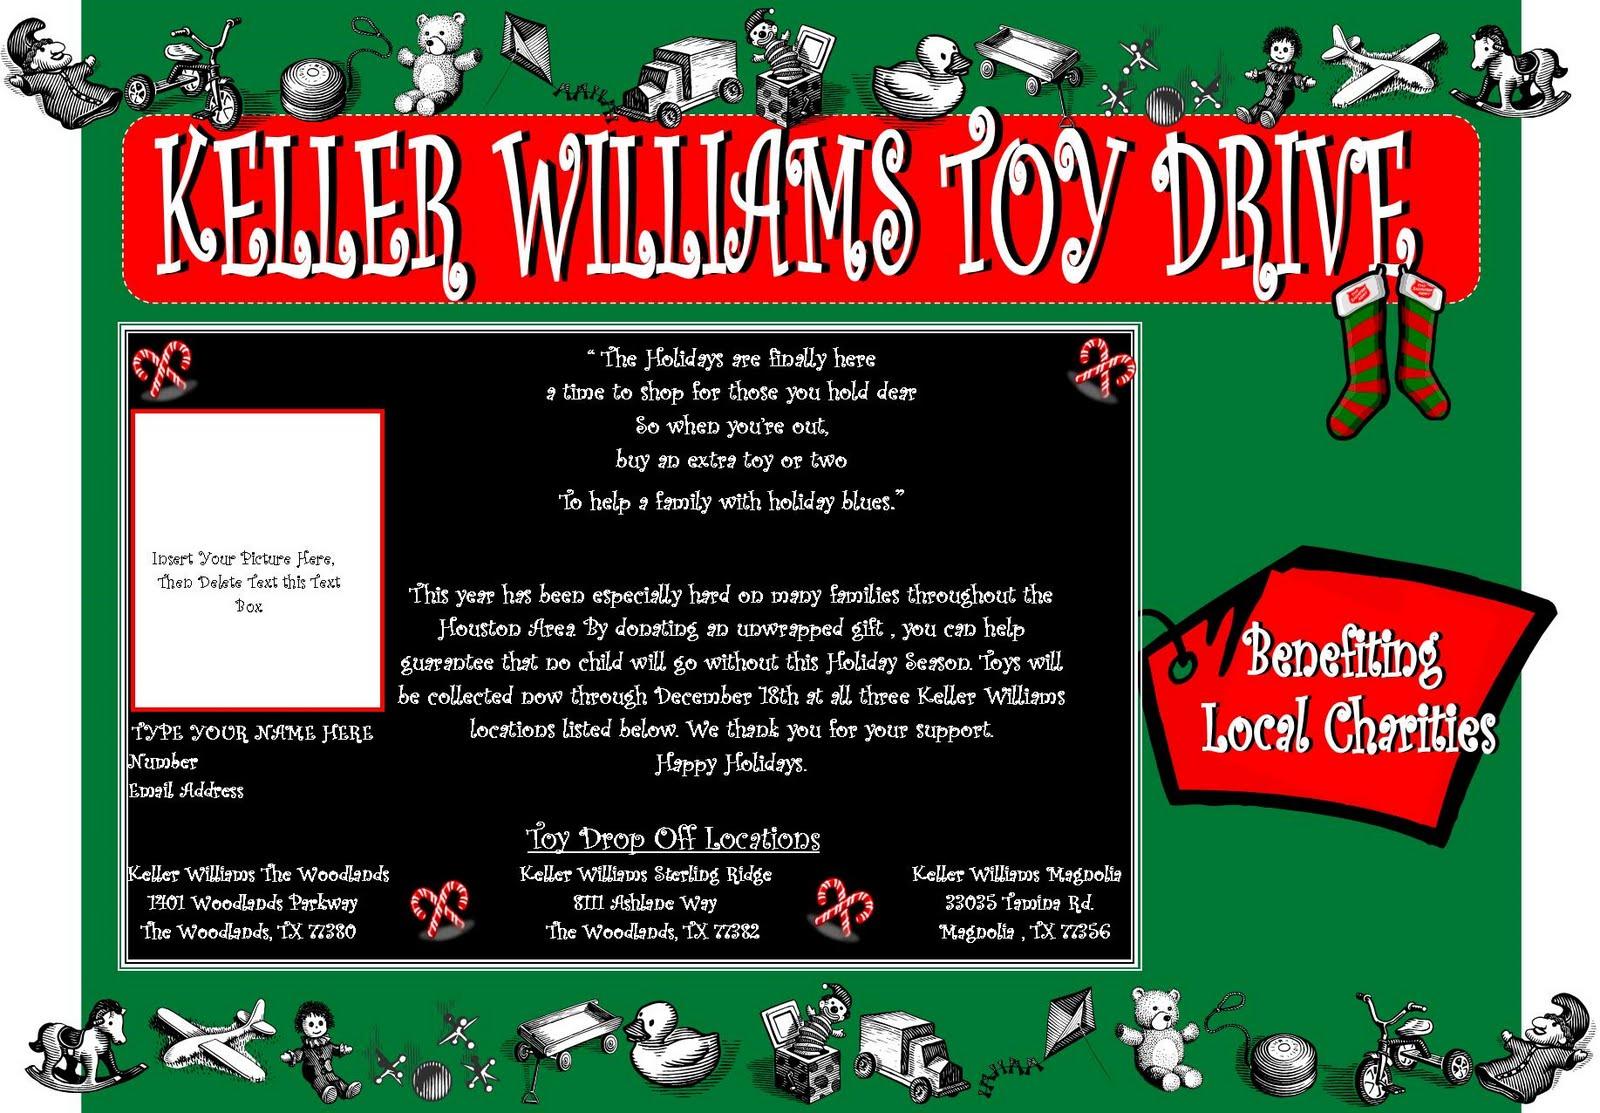 keller williams newsletter christmas toy drive mailout christmas toy drive mailout